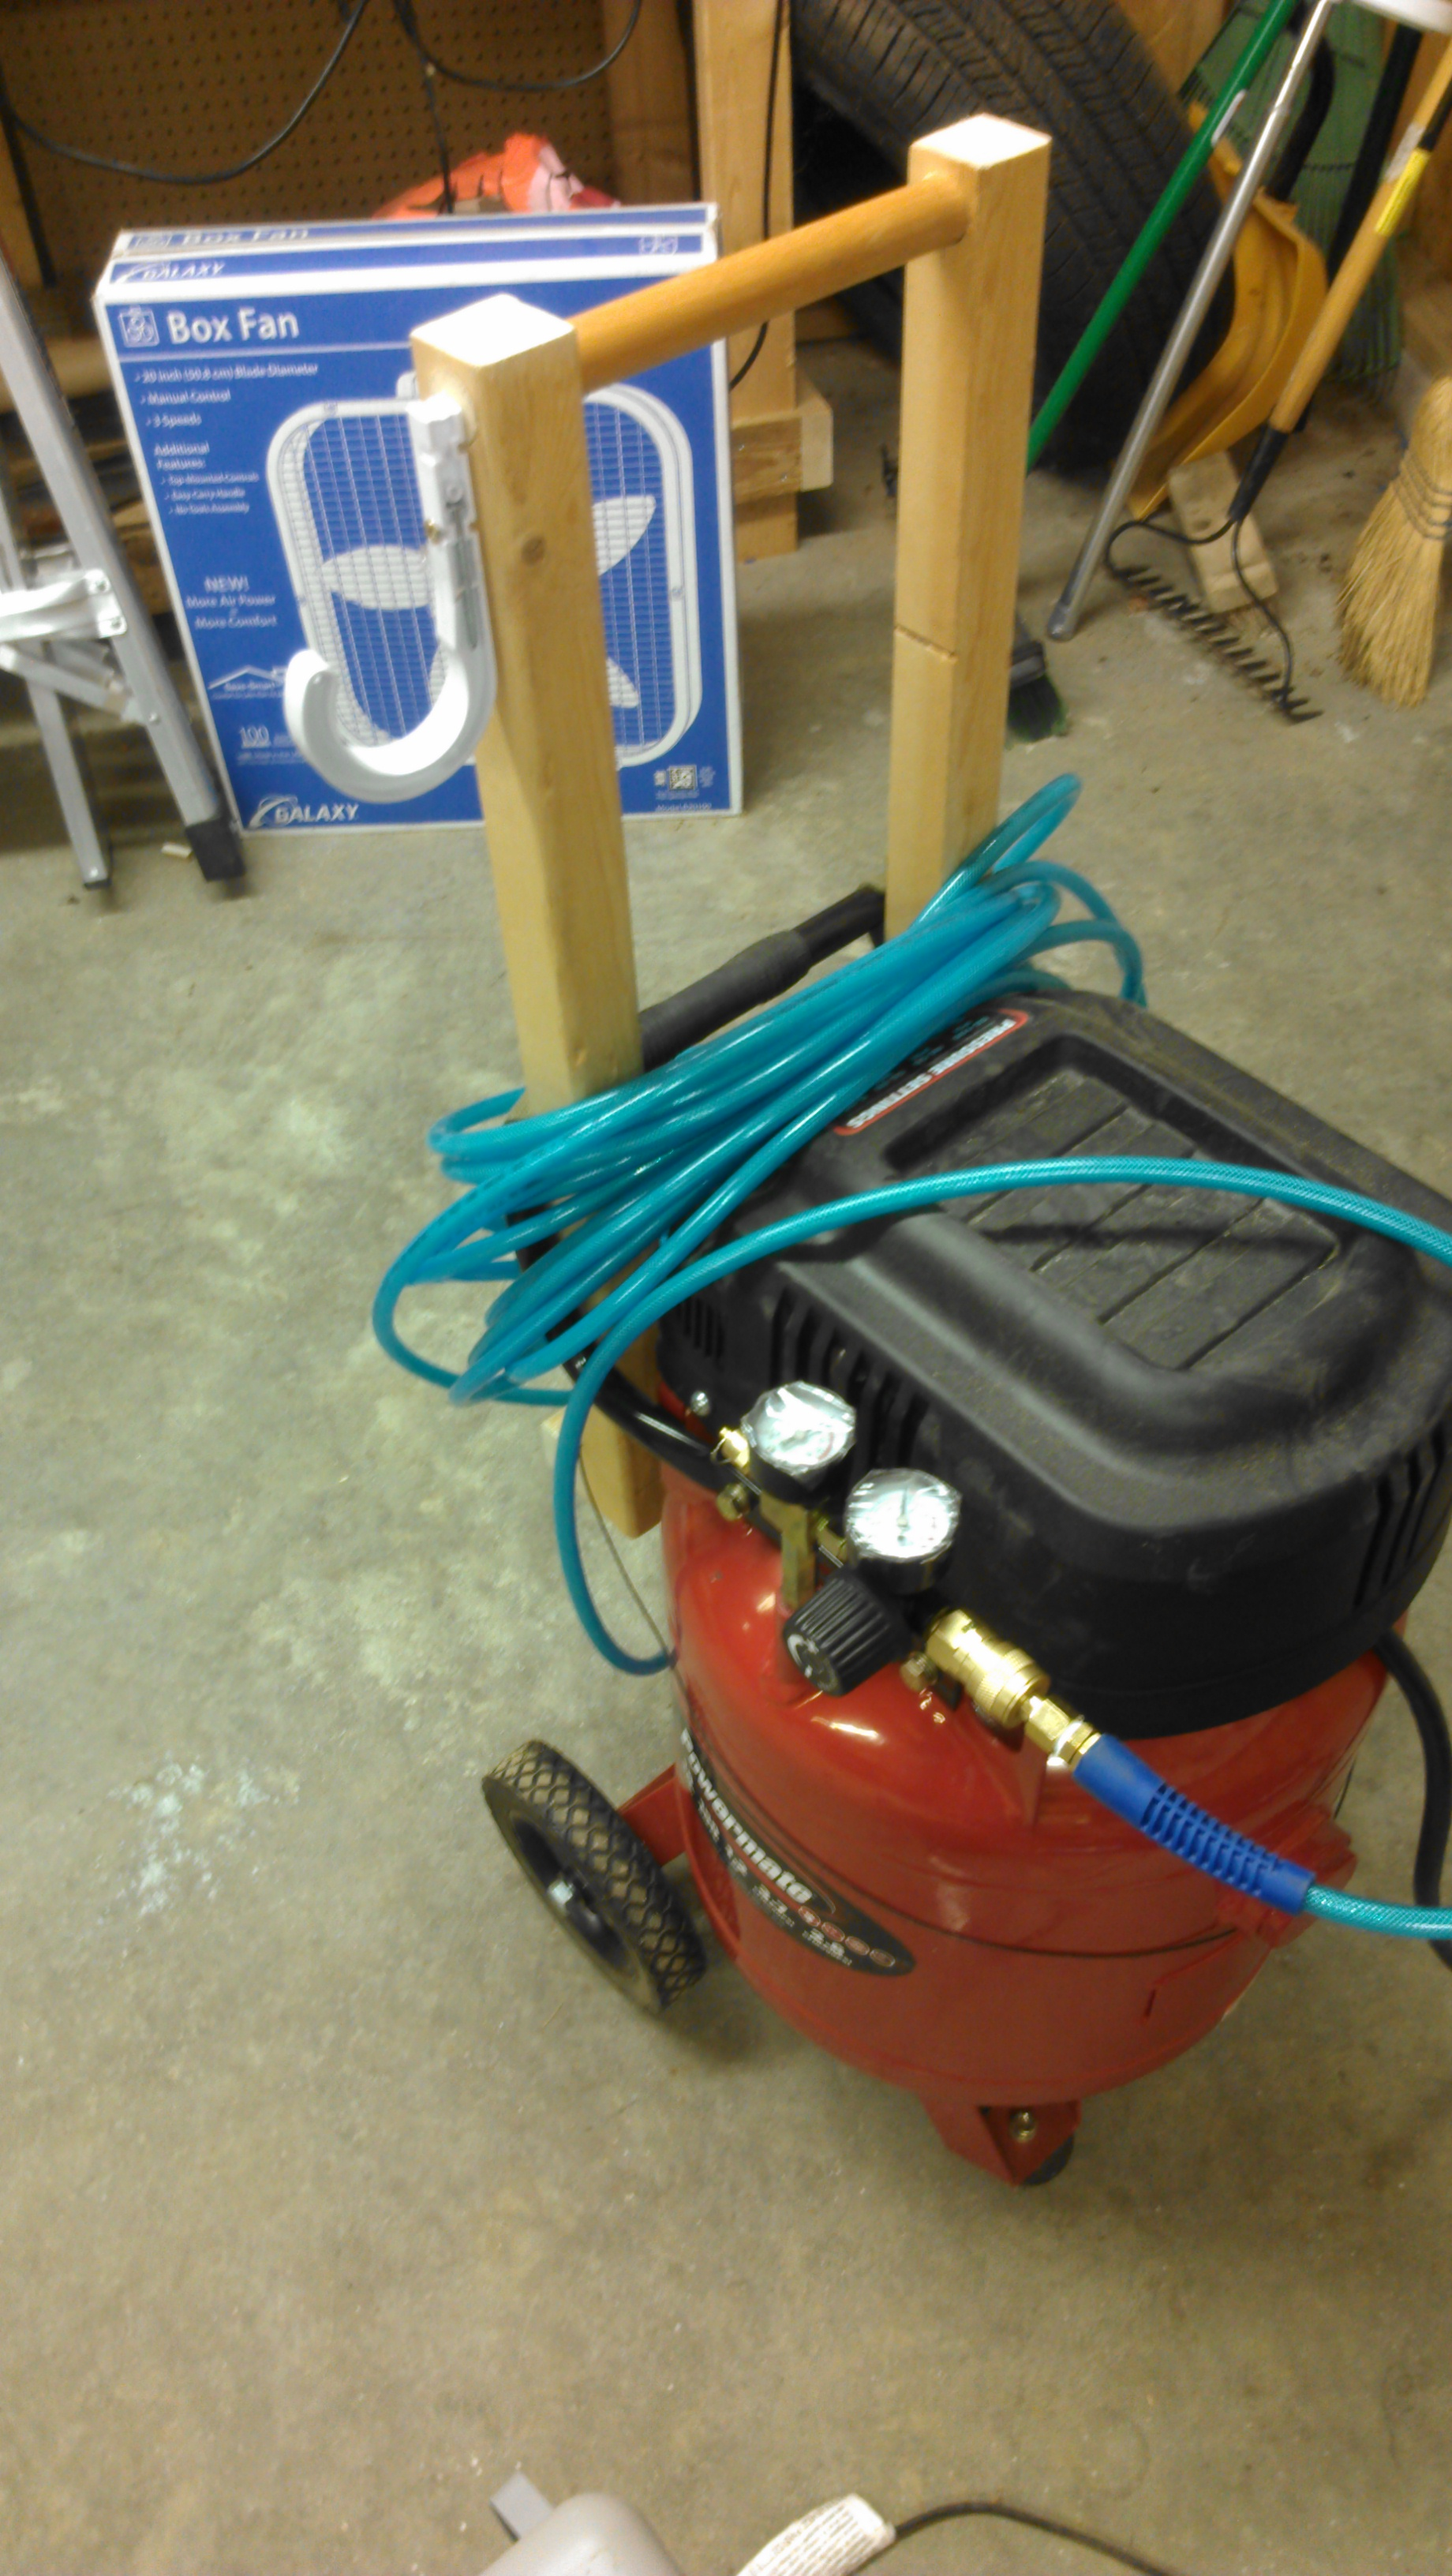 New compressor handle